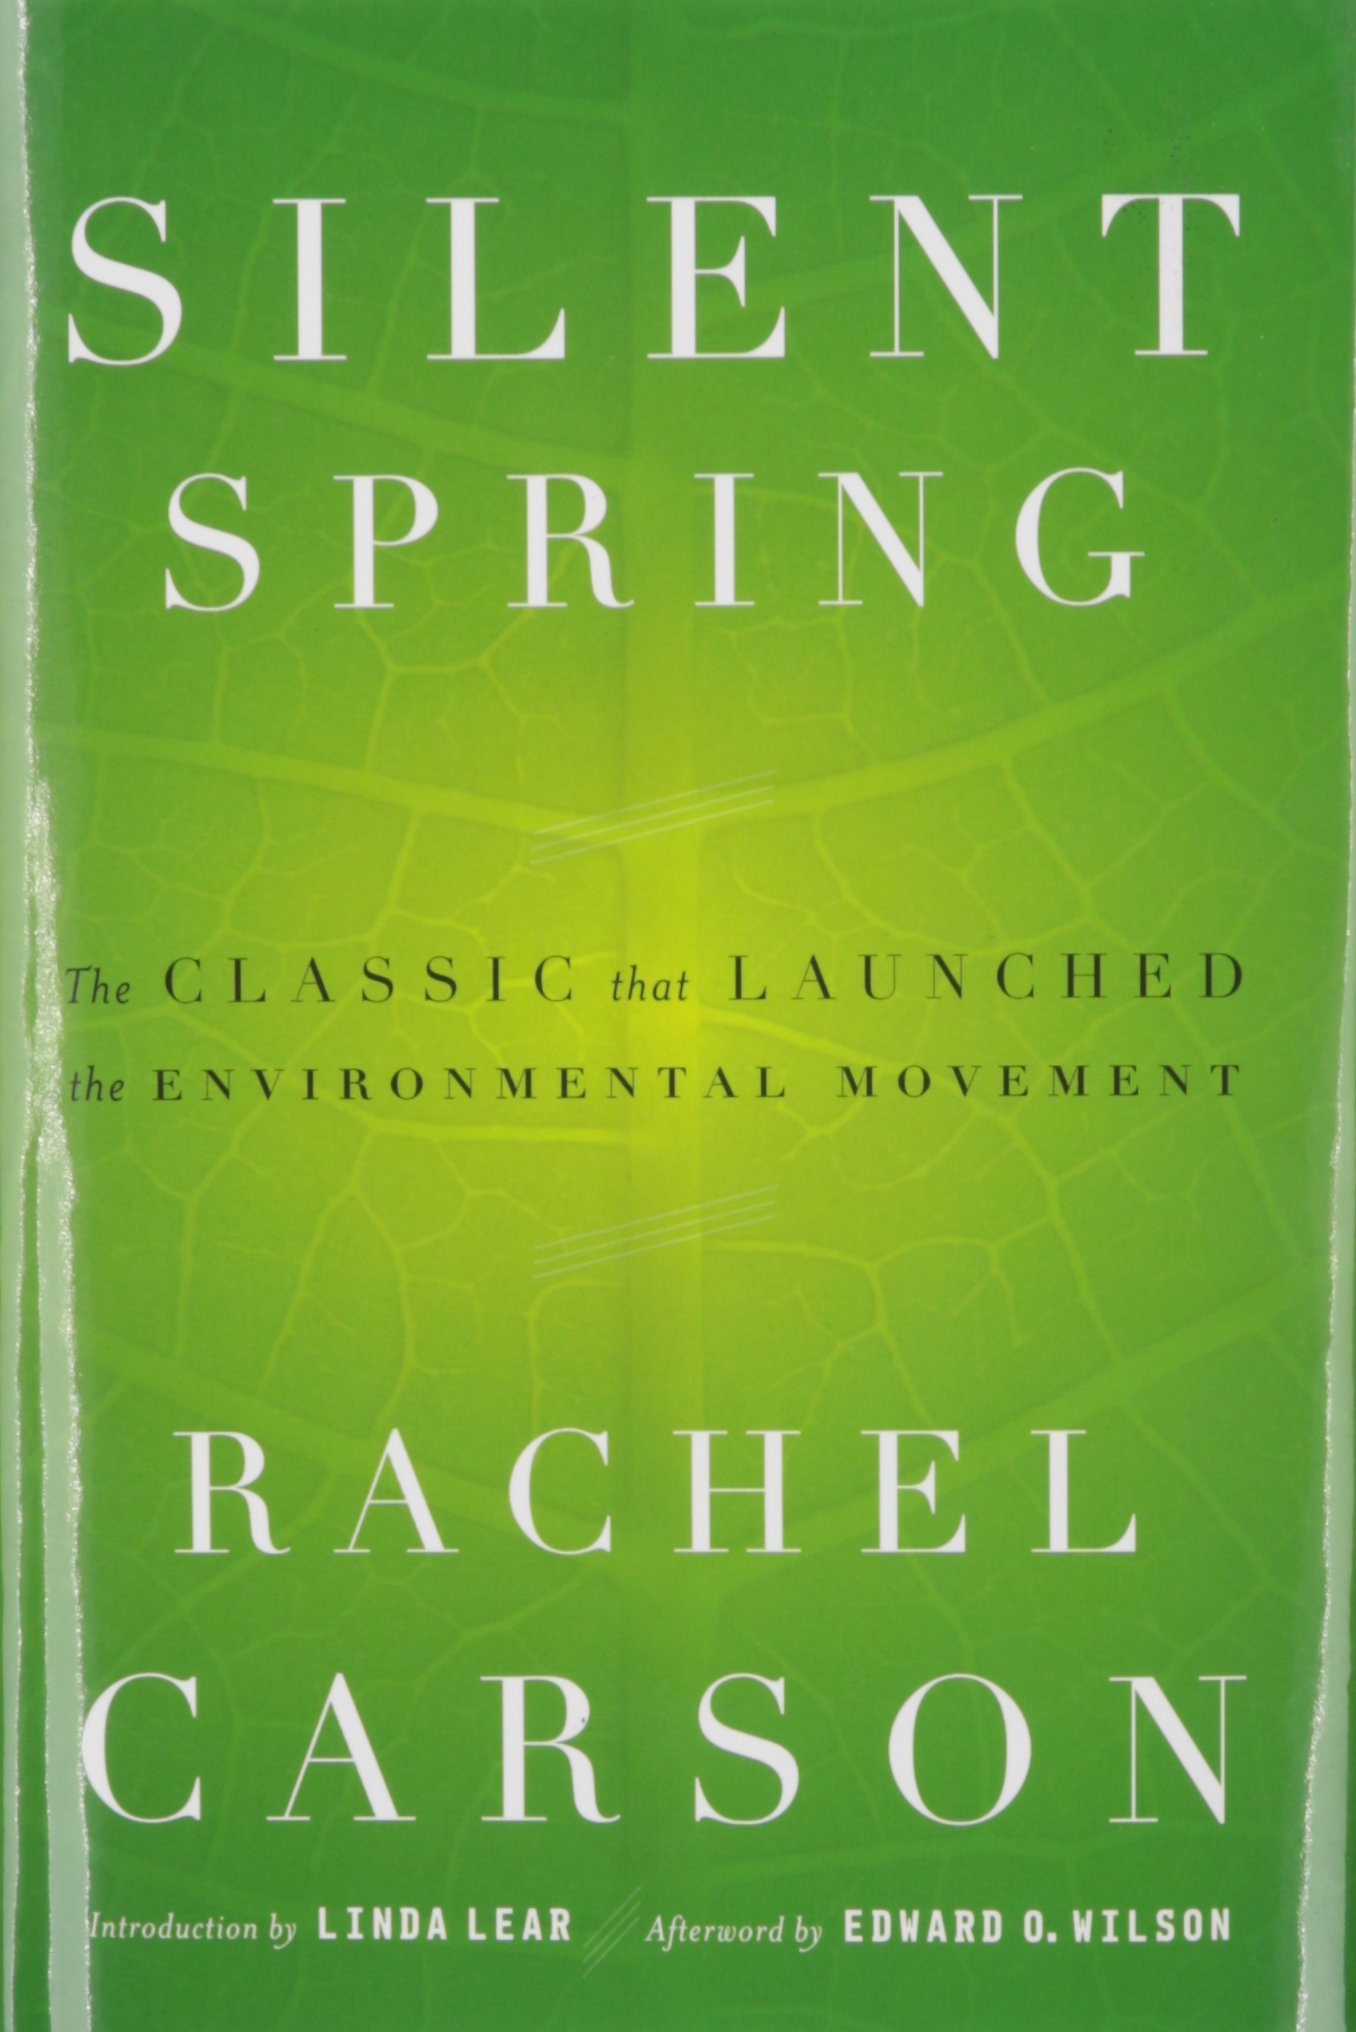 Silent Spring by Houghton Mifflin Harcourt